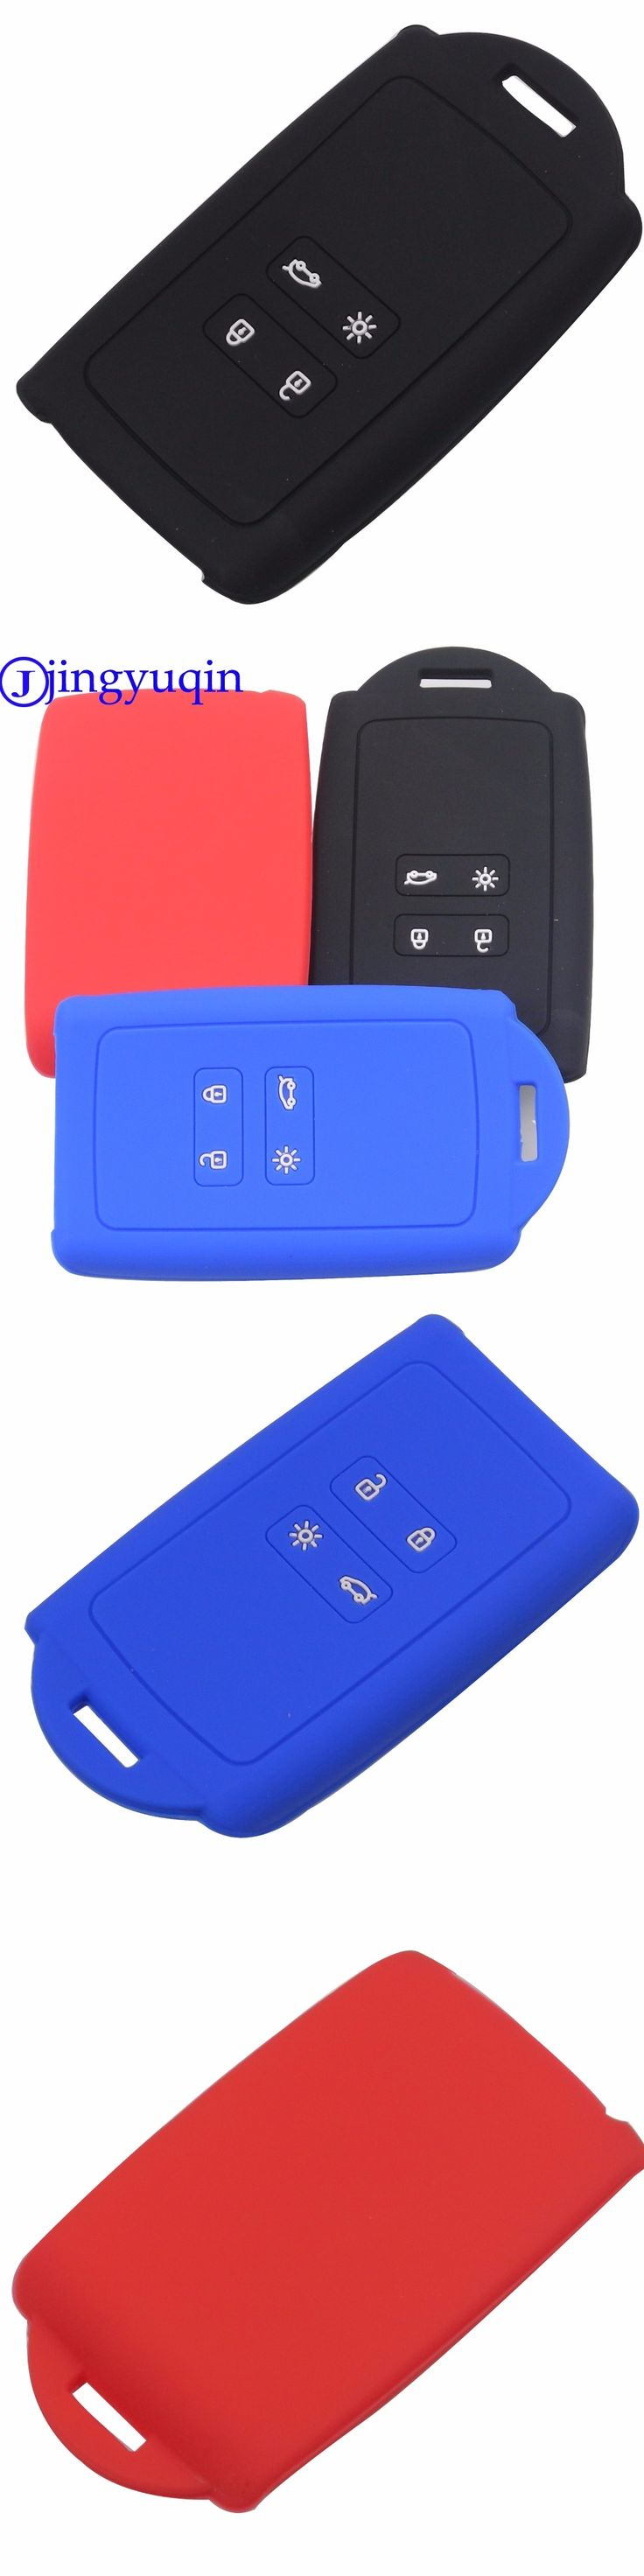 jingyuqin Silicone Car Key Case Key Protection Cover For Renault Koleos Kadjar 2016-2017 Remote Holder Protector Accessories